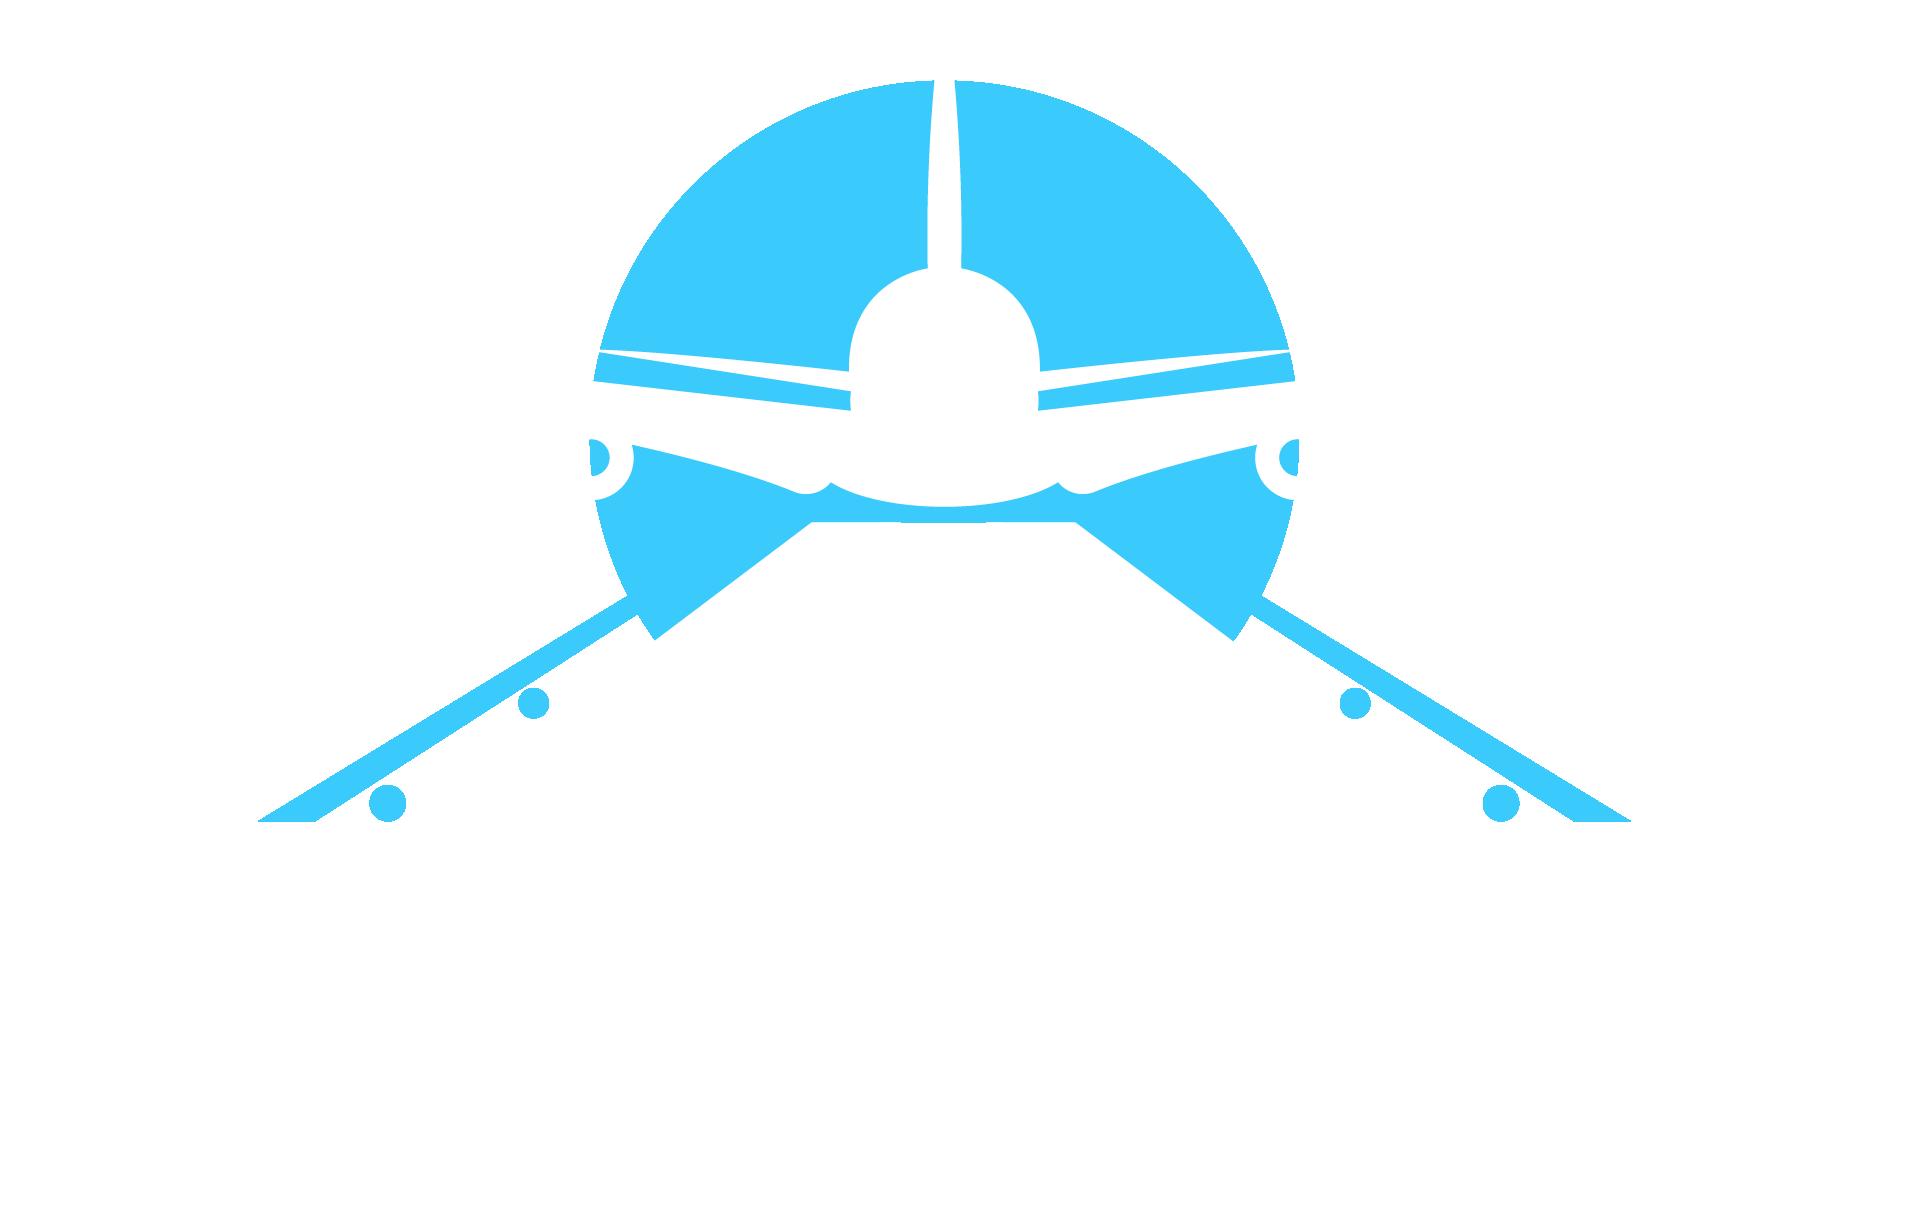 Airport lighting supply company needs new logo